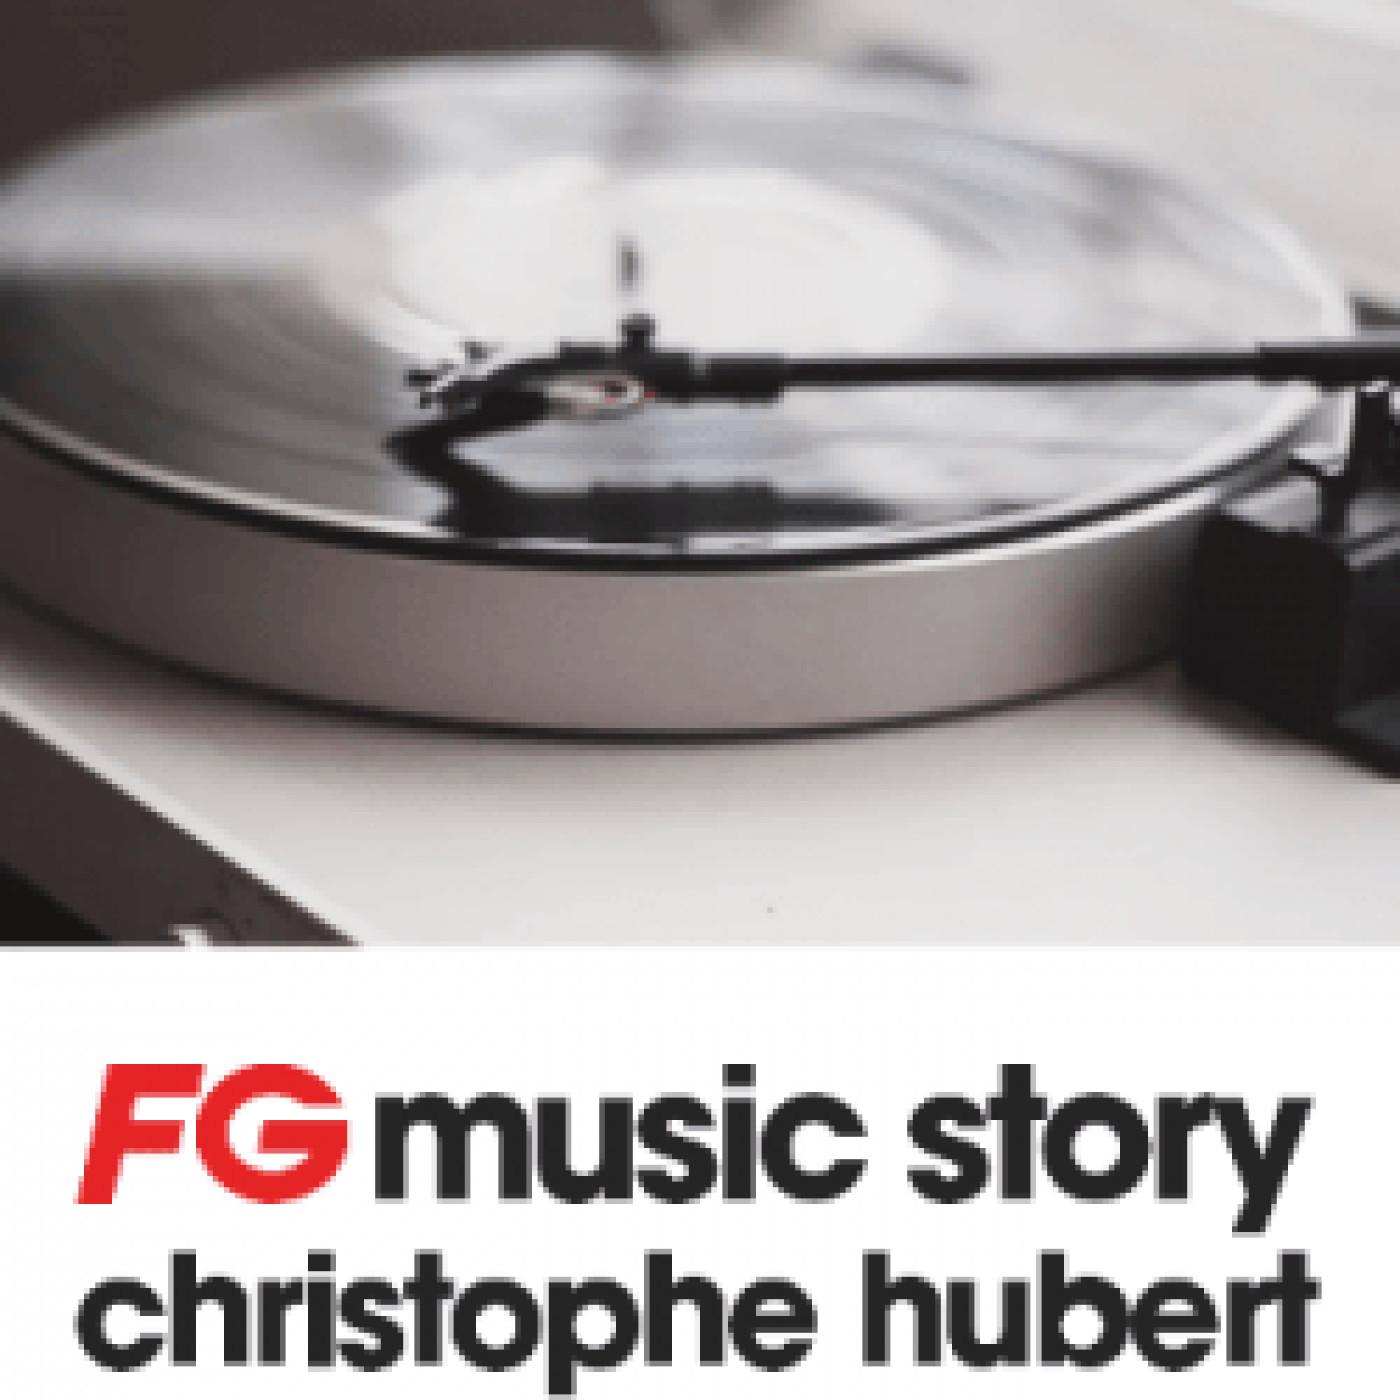 FG MUSIC STORY : MEDUZA